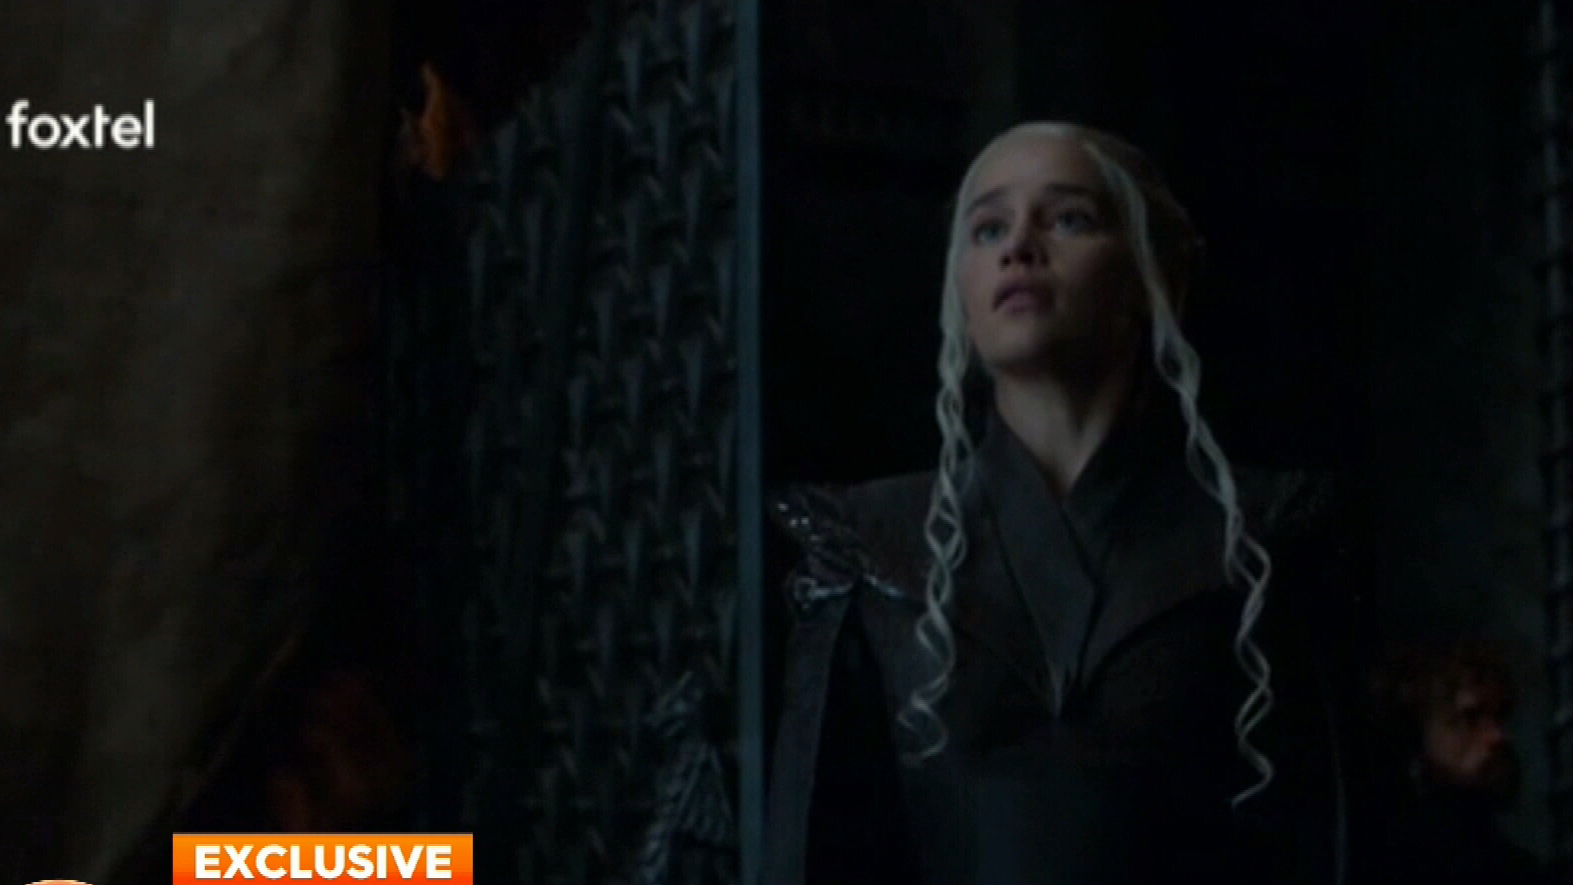 Entertainment news: Game of Thrones returns